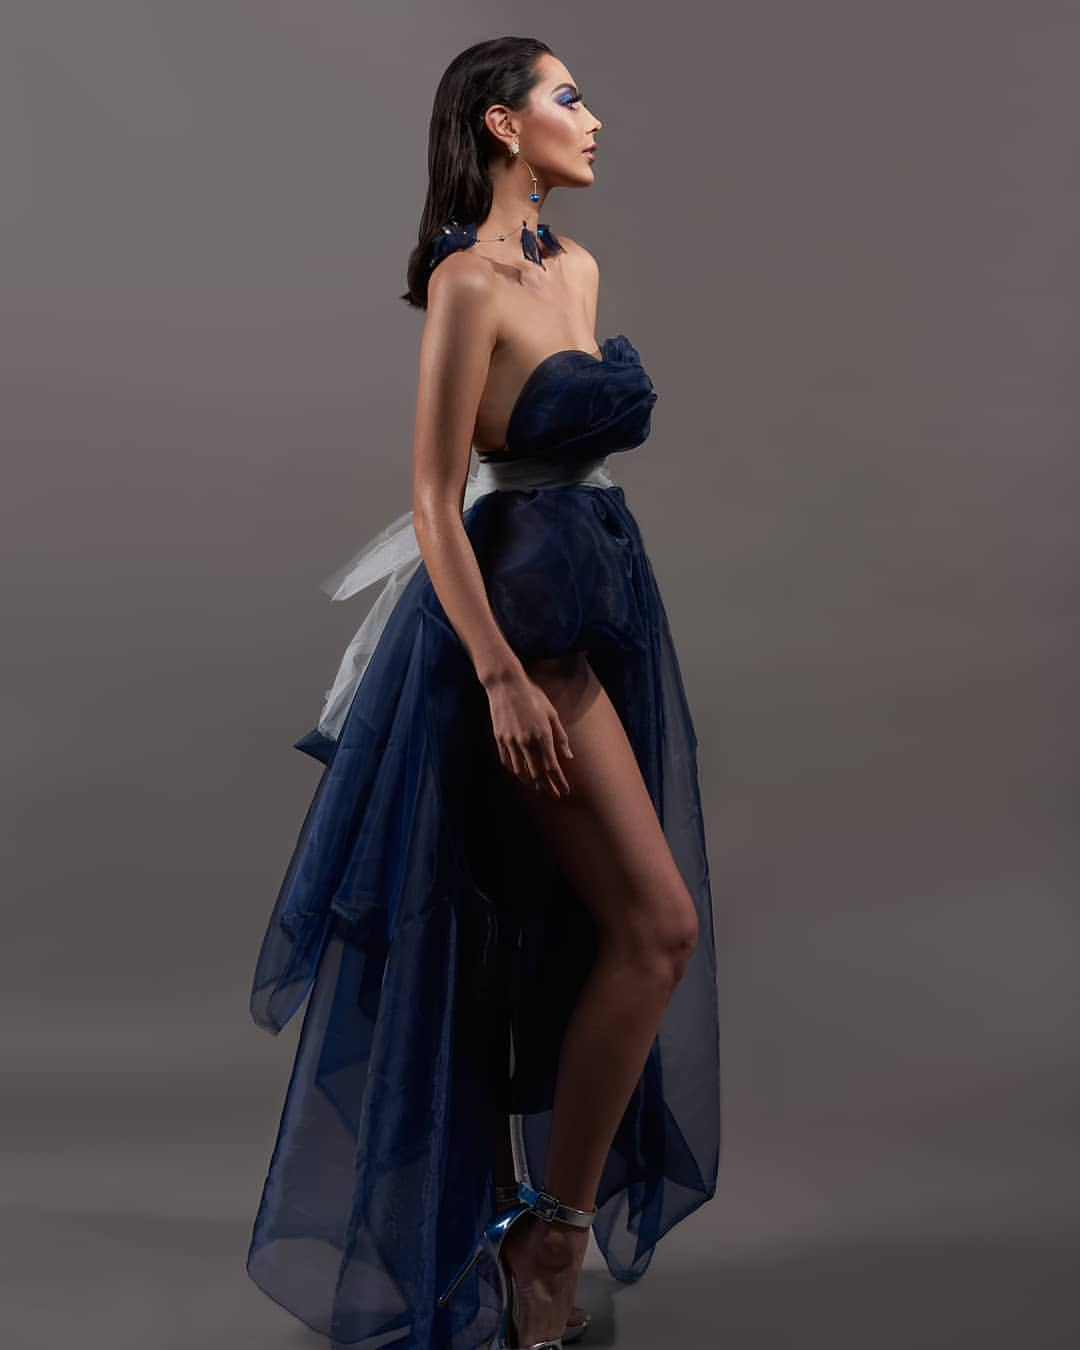 maria malo, 1st runner-up de miss grand international 2019. - Página 5 61182310